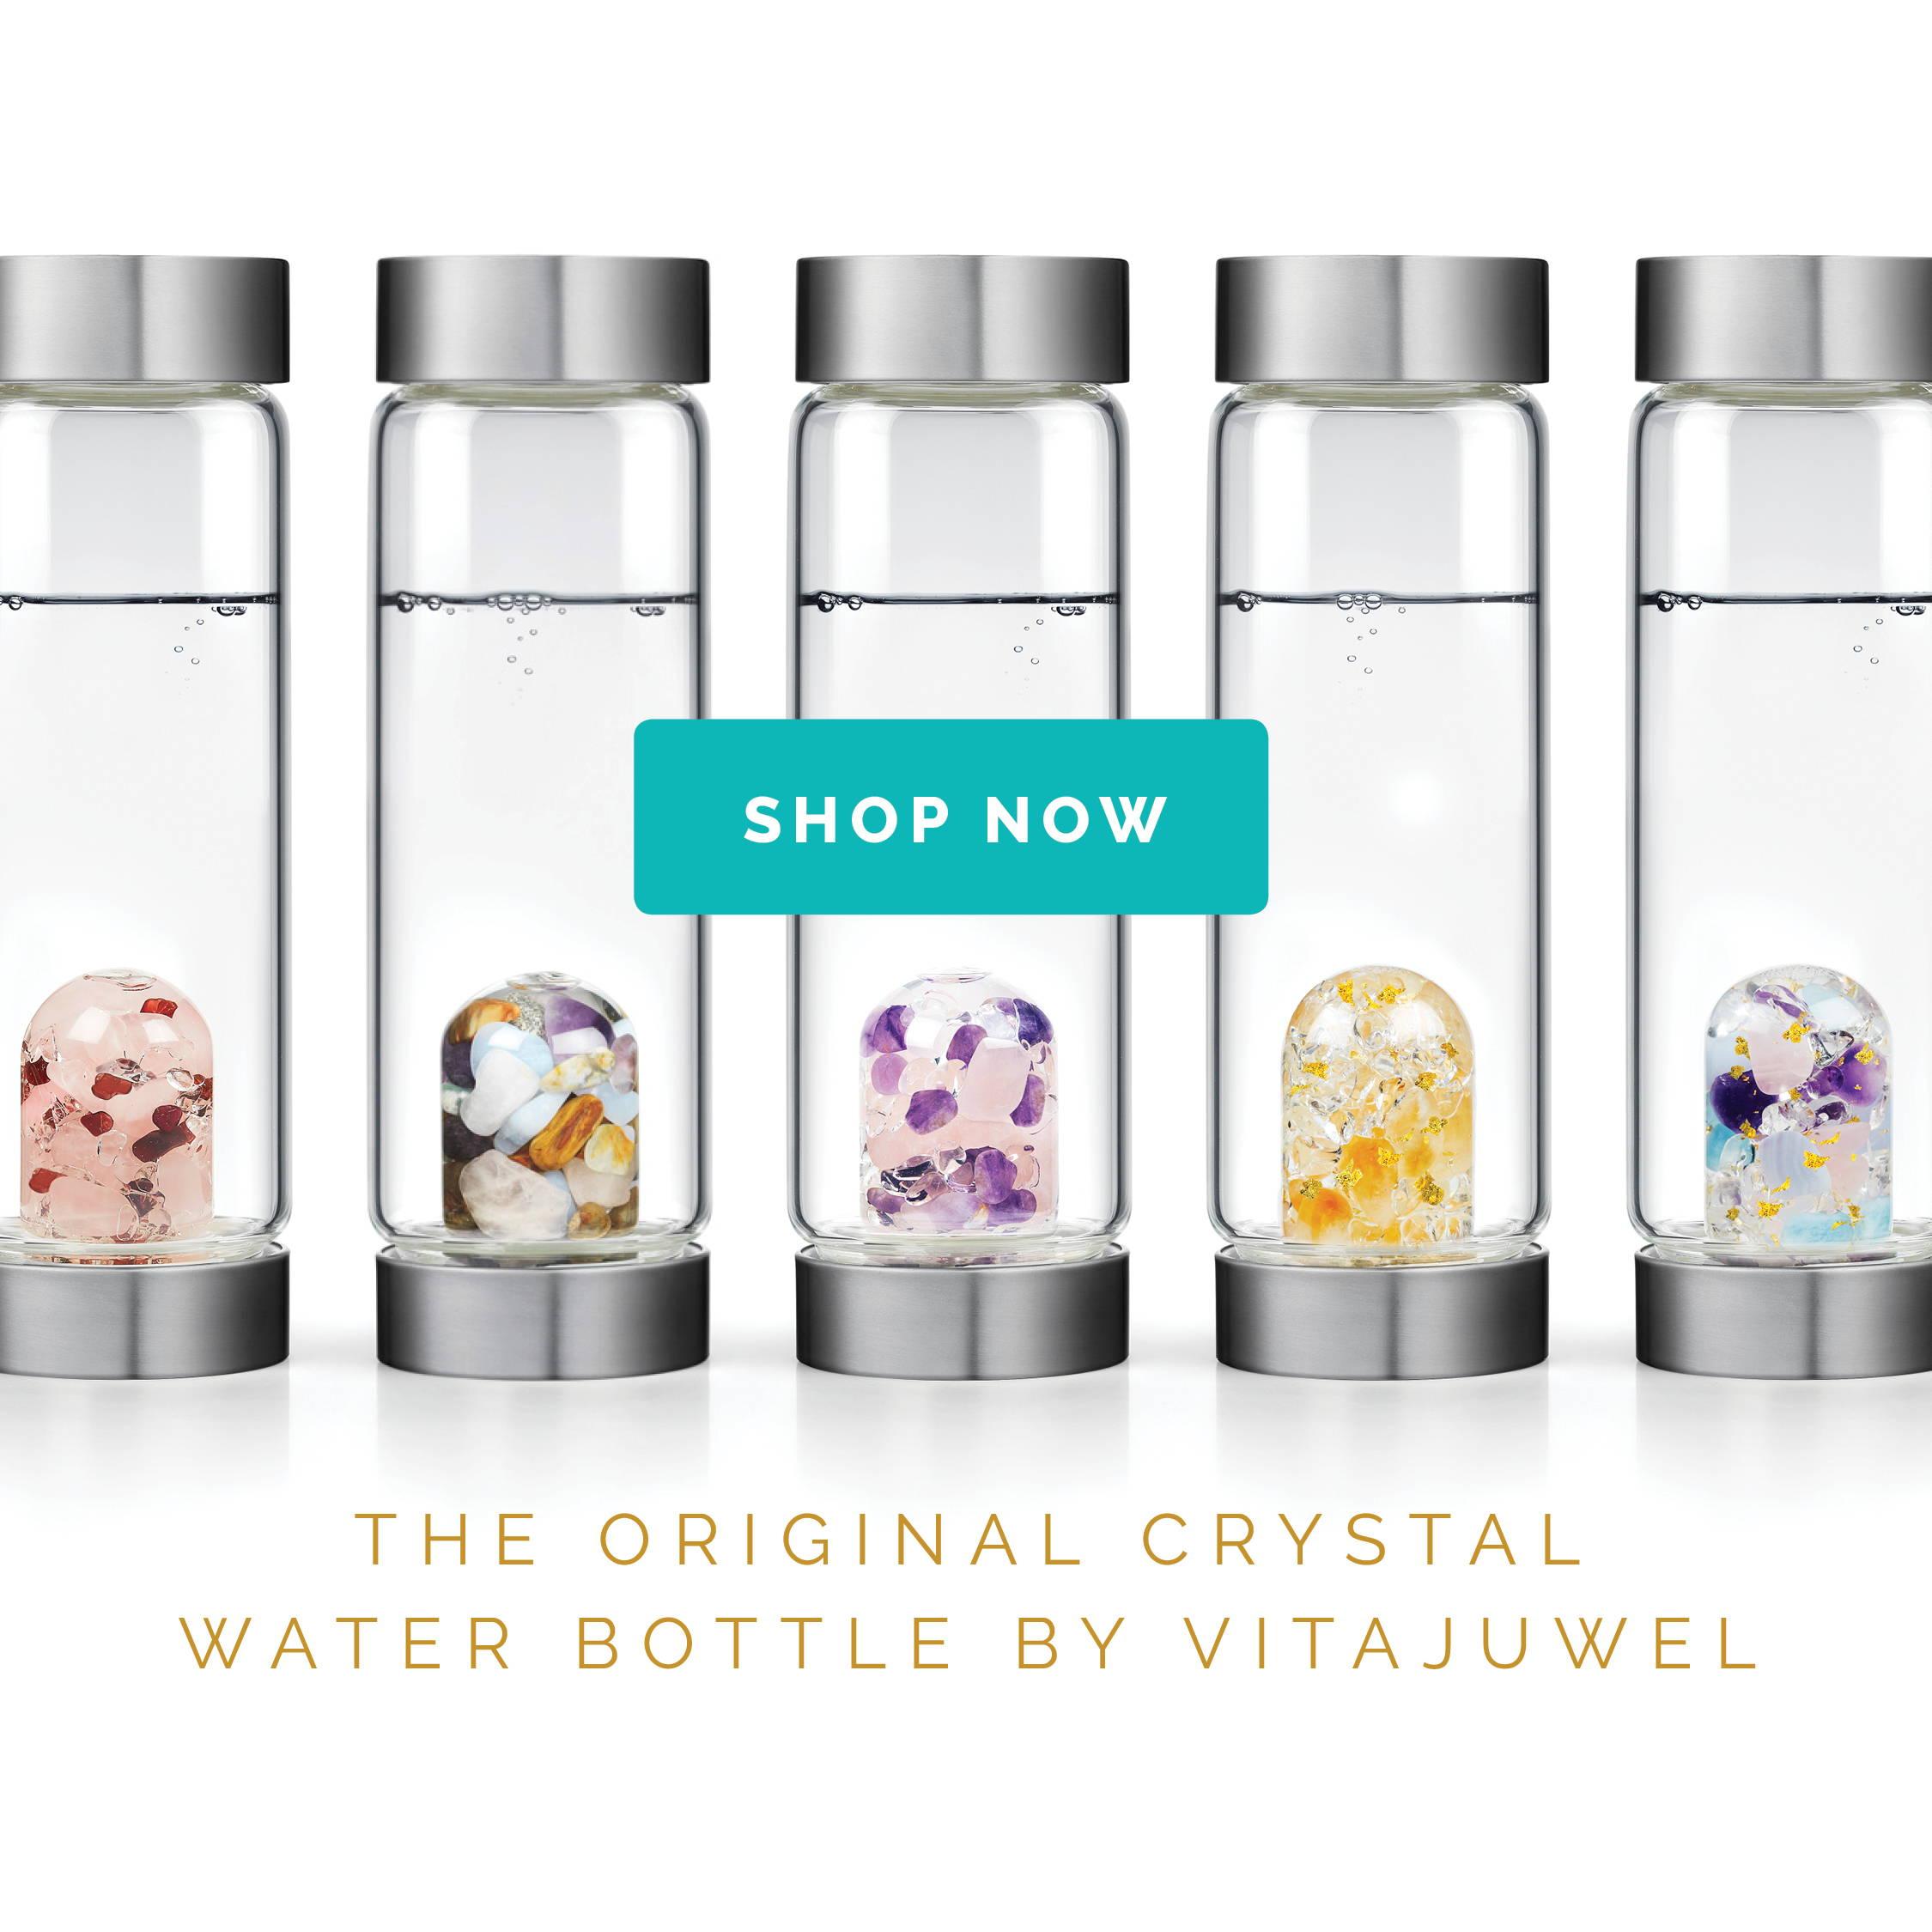 Gem-Water Bottles by VitaJuwel